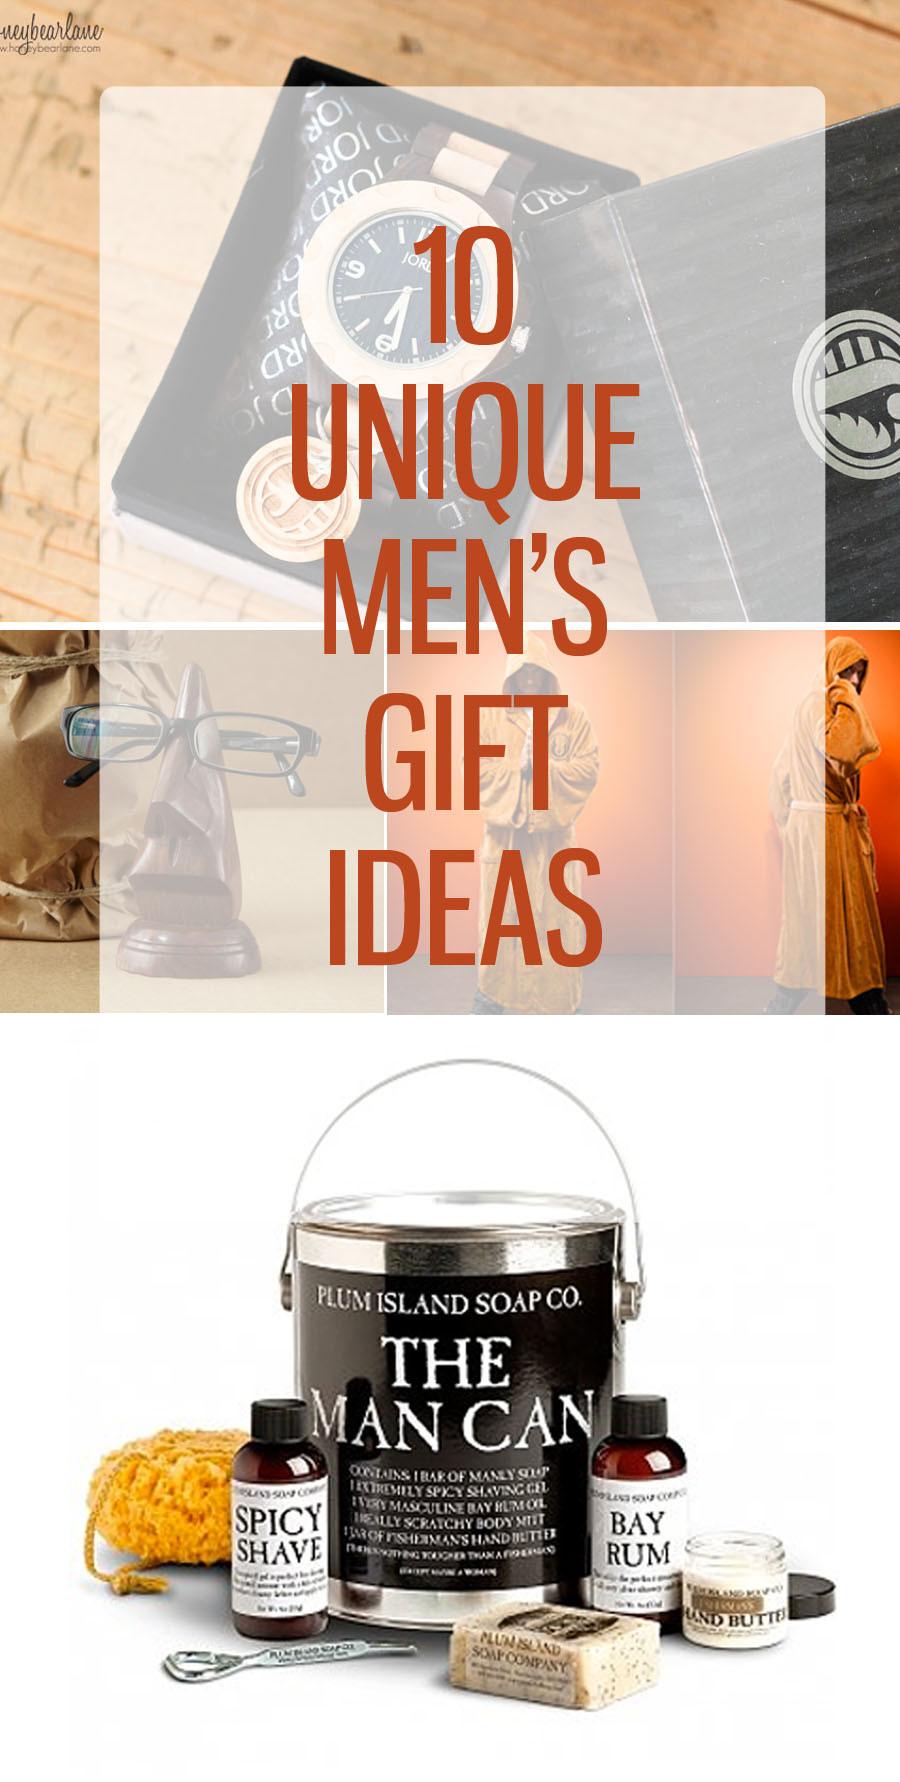 Male Birthday Gift Ideas  10 Unique Mens Gift Ideas HoneyBear Lane